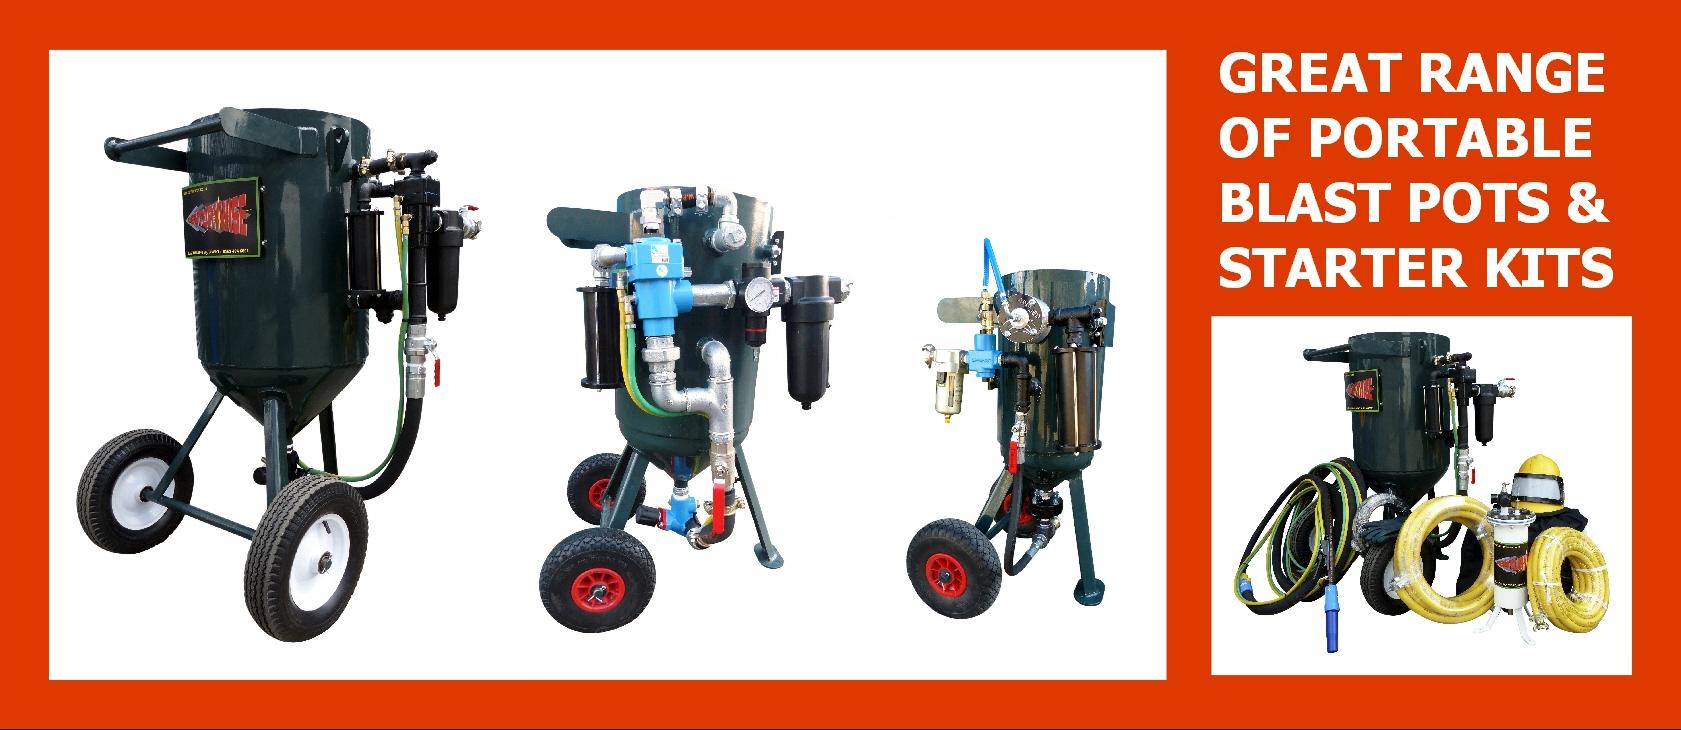 Blast Cleaning Pressure Washing Equipment Centurywise